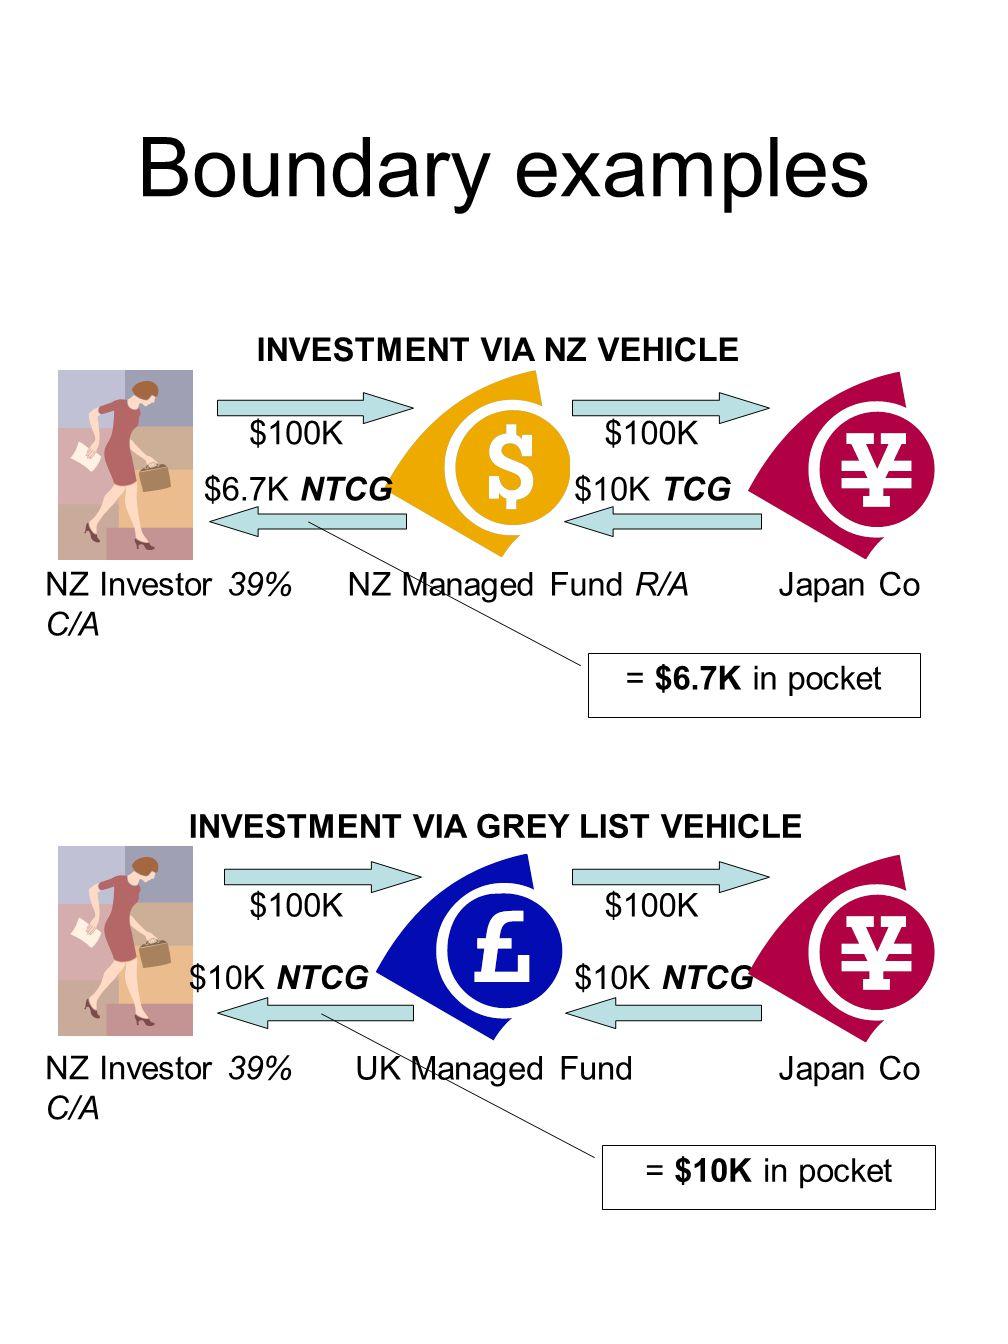 Boundary examples NZ Investor 39% C/A NZ Managed Fund R/AJapan Co $100K $10K TCG$6.7K NTCG INVESTMENT VIA NZ VEHICLE = $6.7K in pocket UK Managed FundJapan Co NZ Investor 39% C/A $100K $10K NTCG INVESTMENT VIA GREY LIST VEHICLE = $10K in pocket